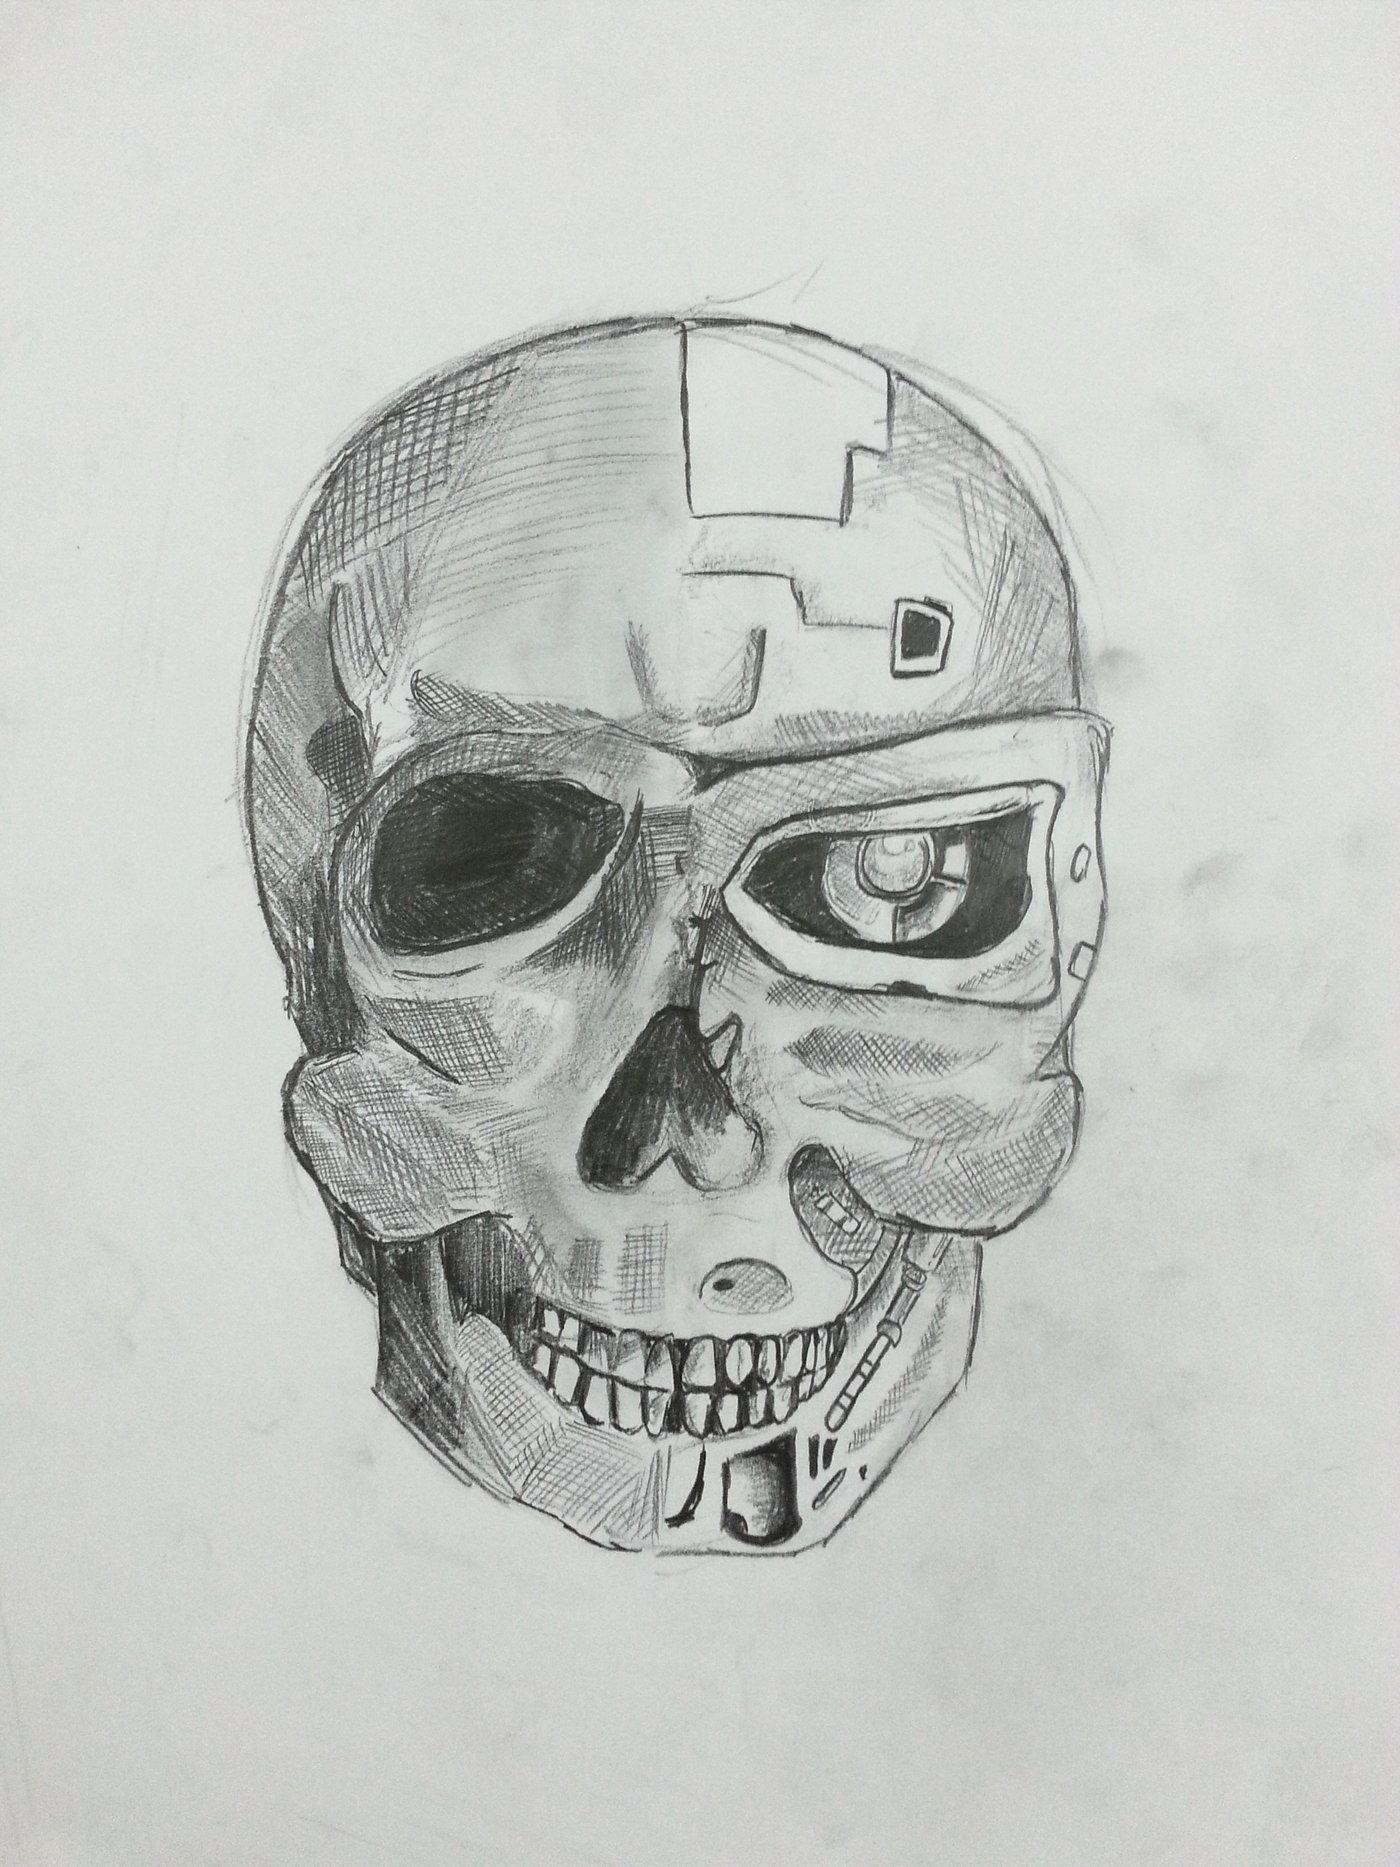 2014 Jan Terminator Human Skull Drawing By Ignatius Ng At Coroflot Com